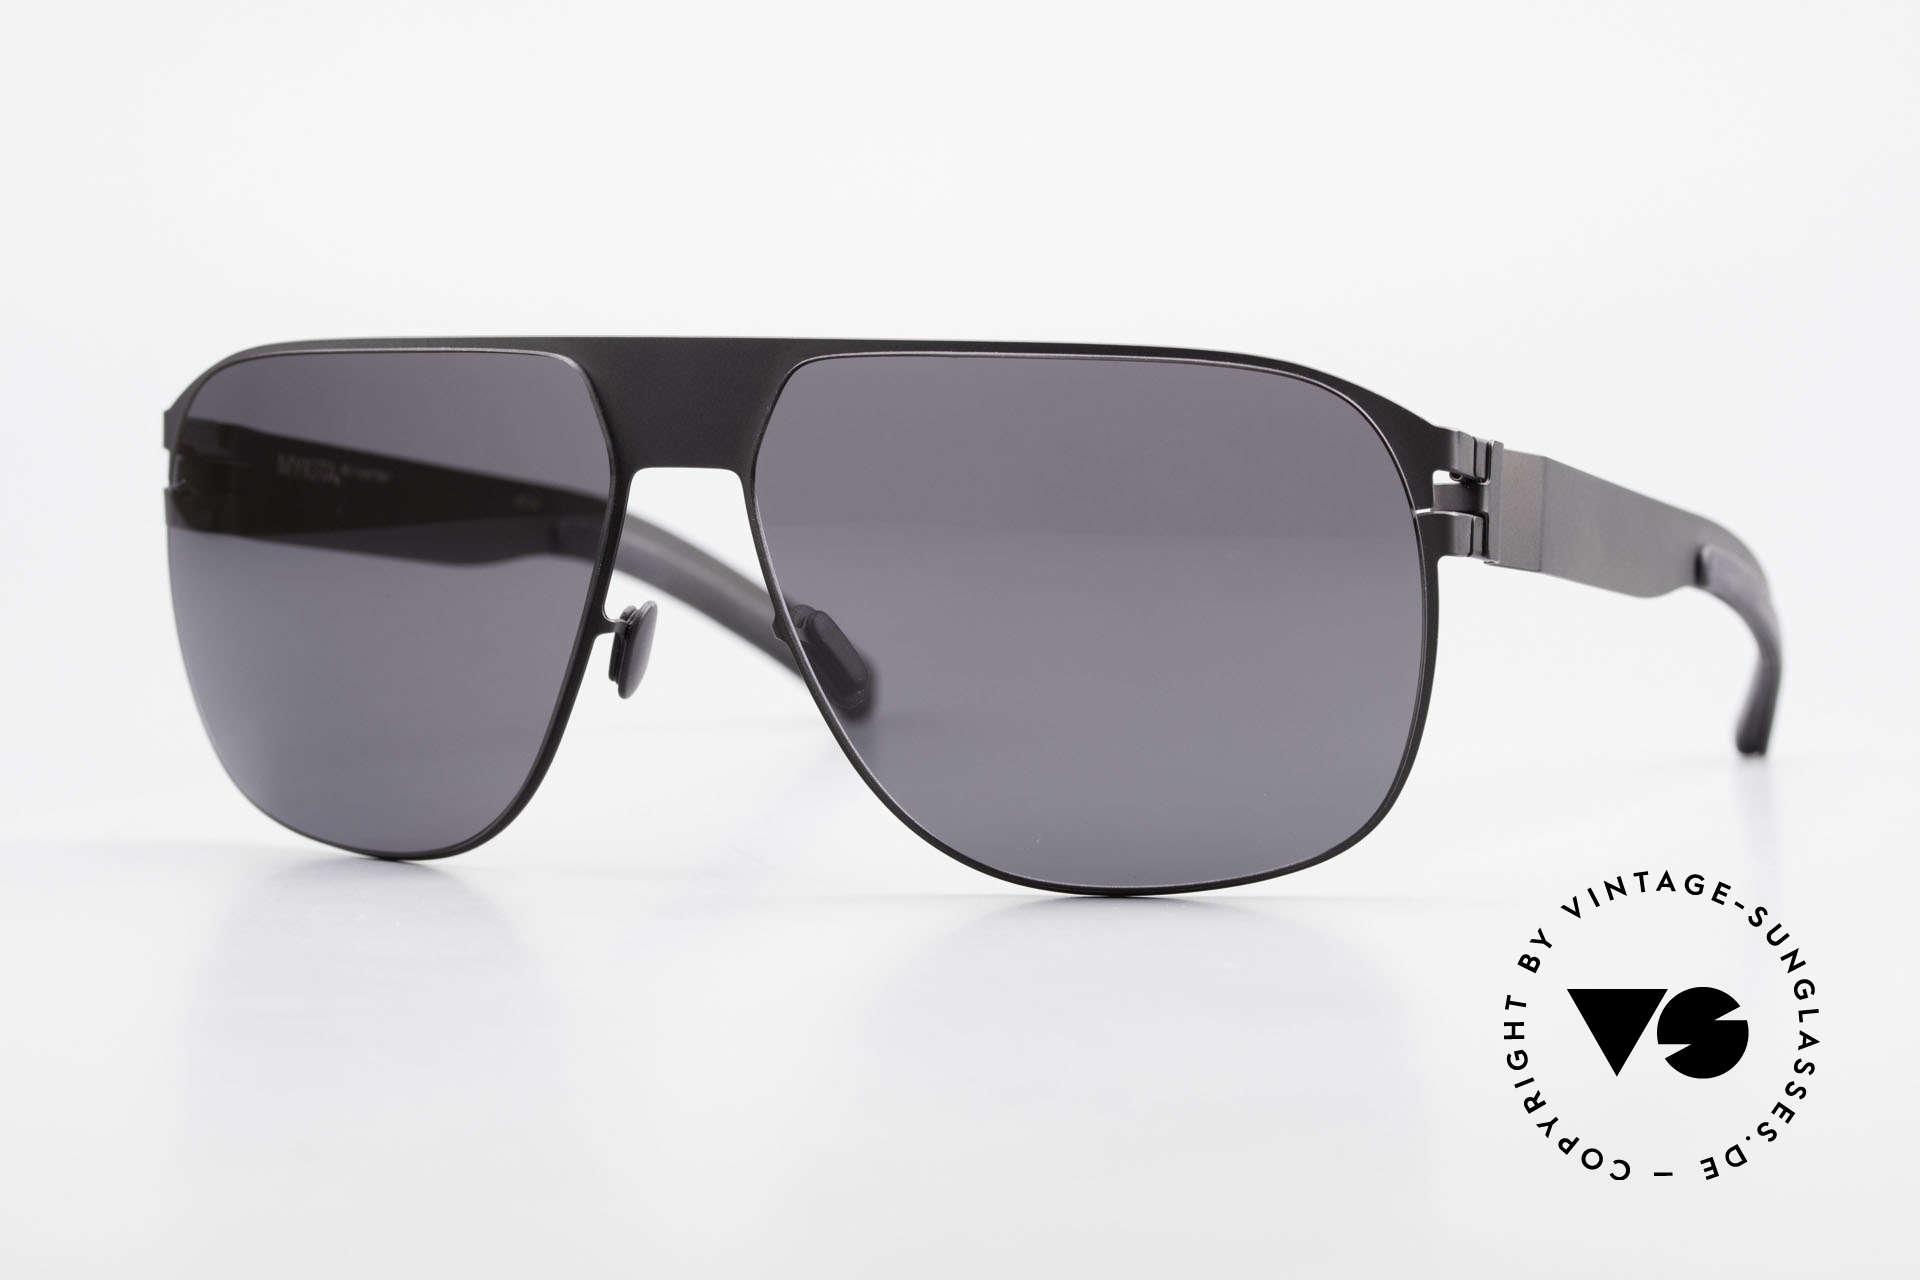 Mykita Tim No 1 Collection Shades 2011's, original VINTAGE Mykita designer sunglasses from 2011, Made for Men